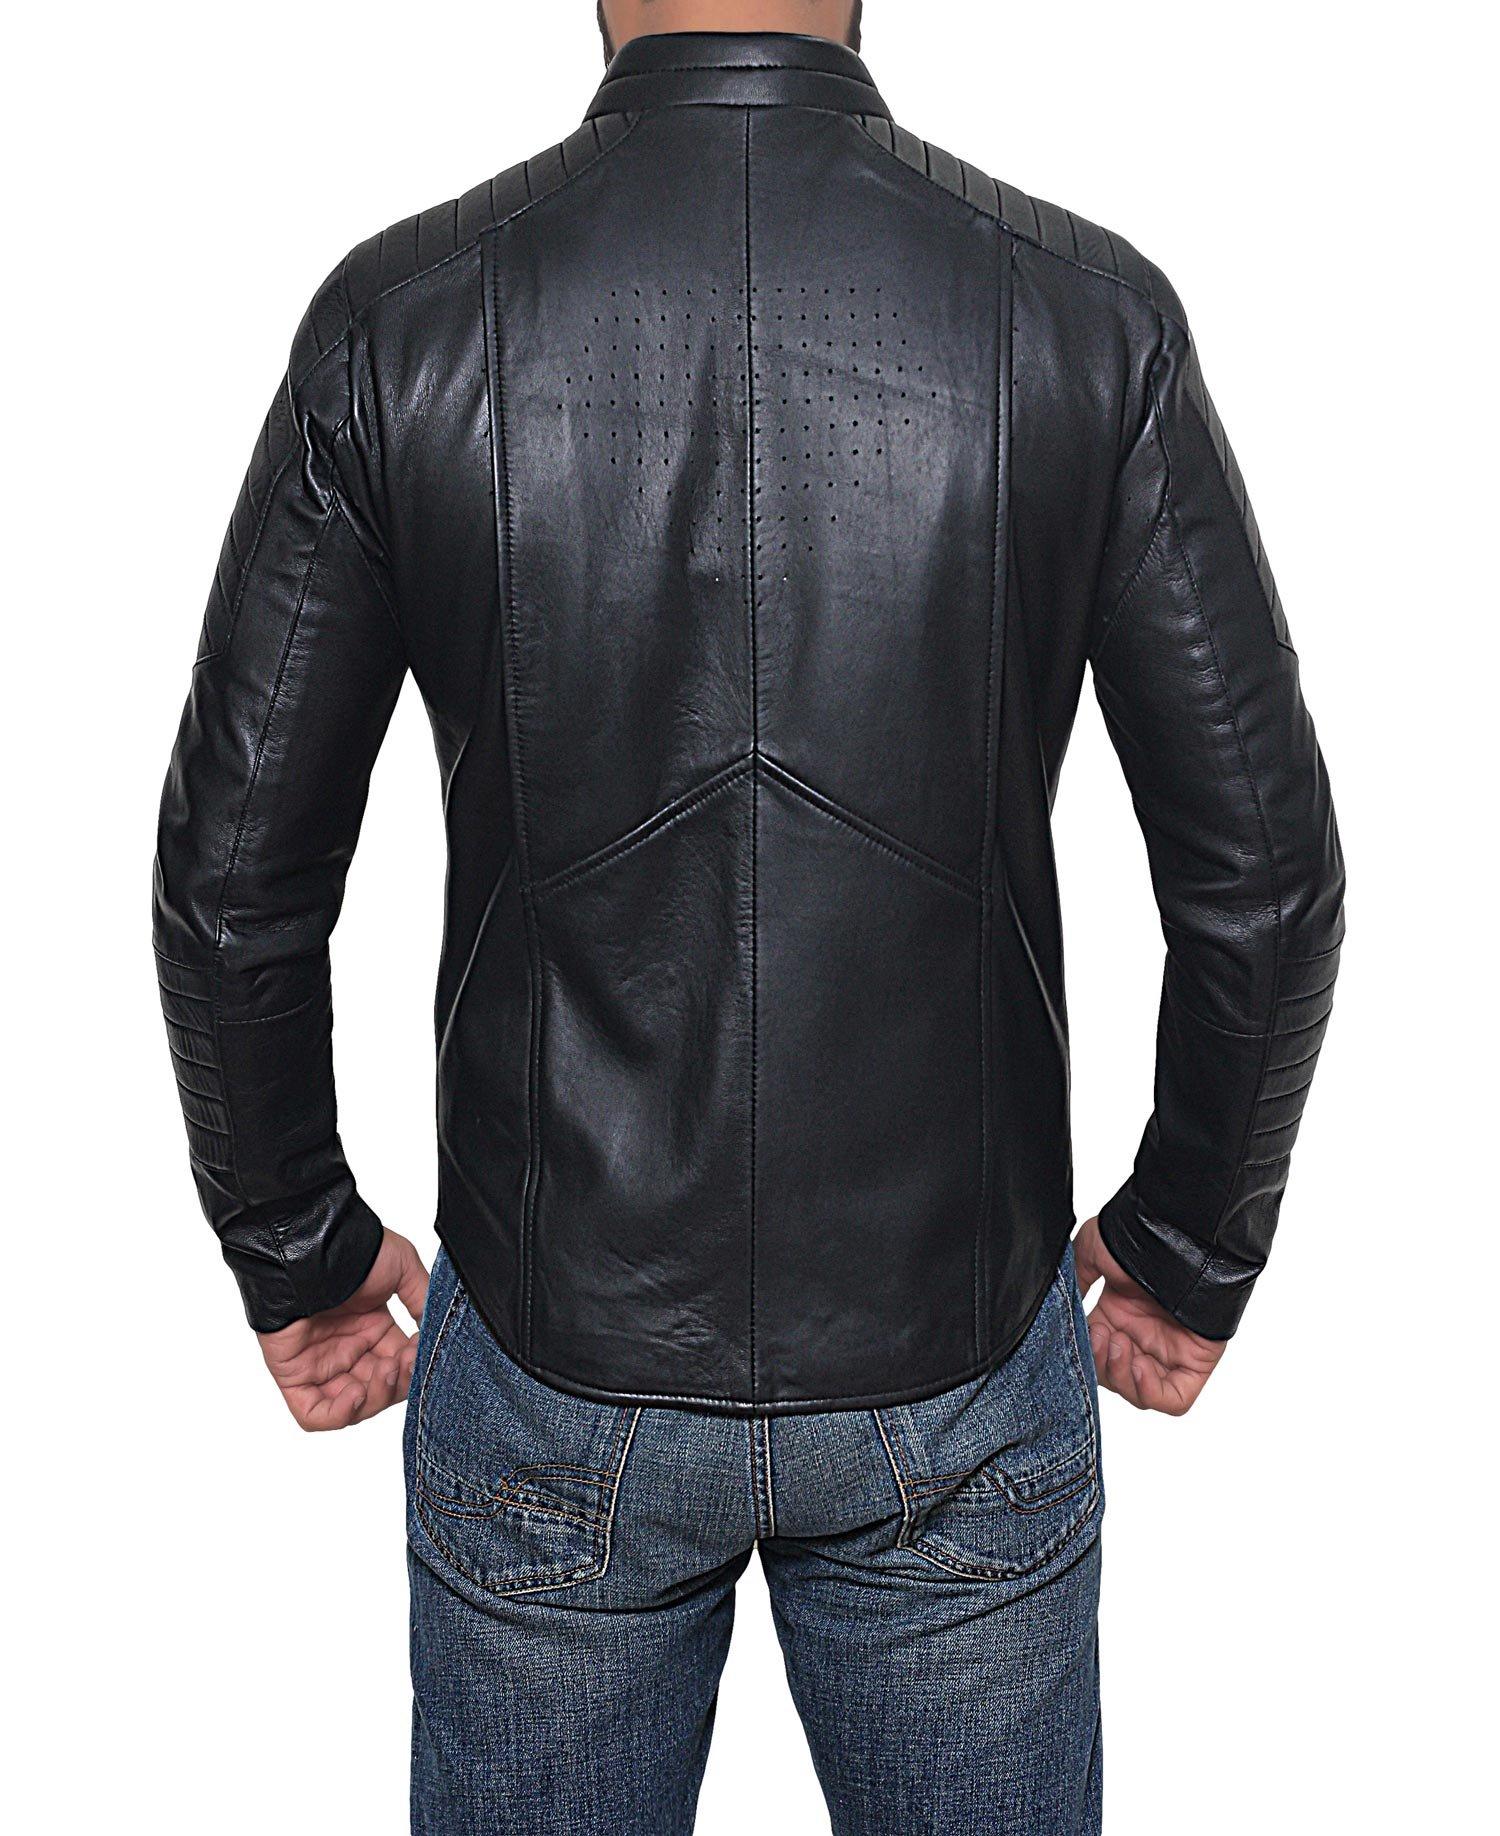 Mens Black Superman Leather Slim Fit Jacket (Superman Jacket, XL) by Decrum (Image #4)